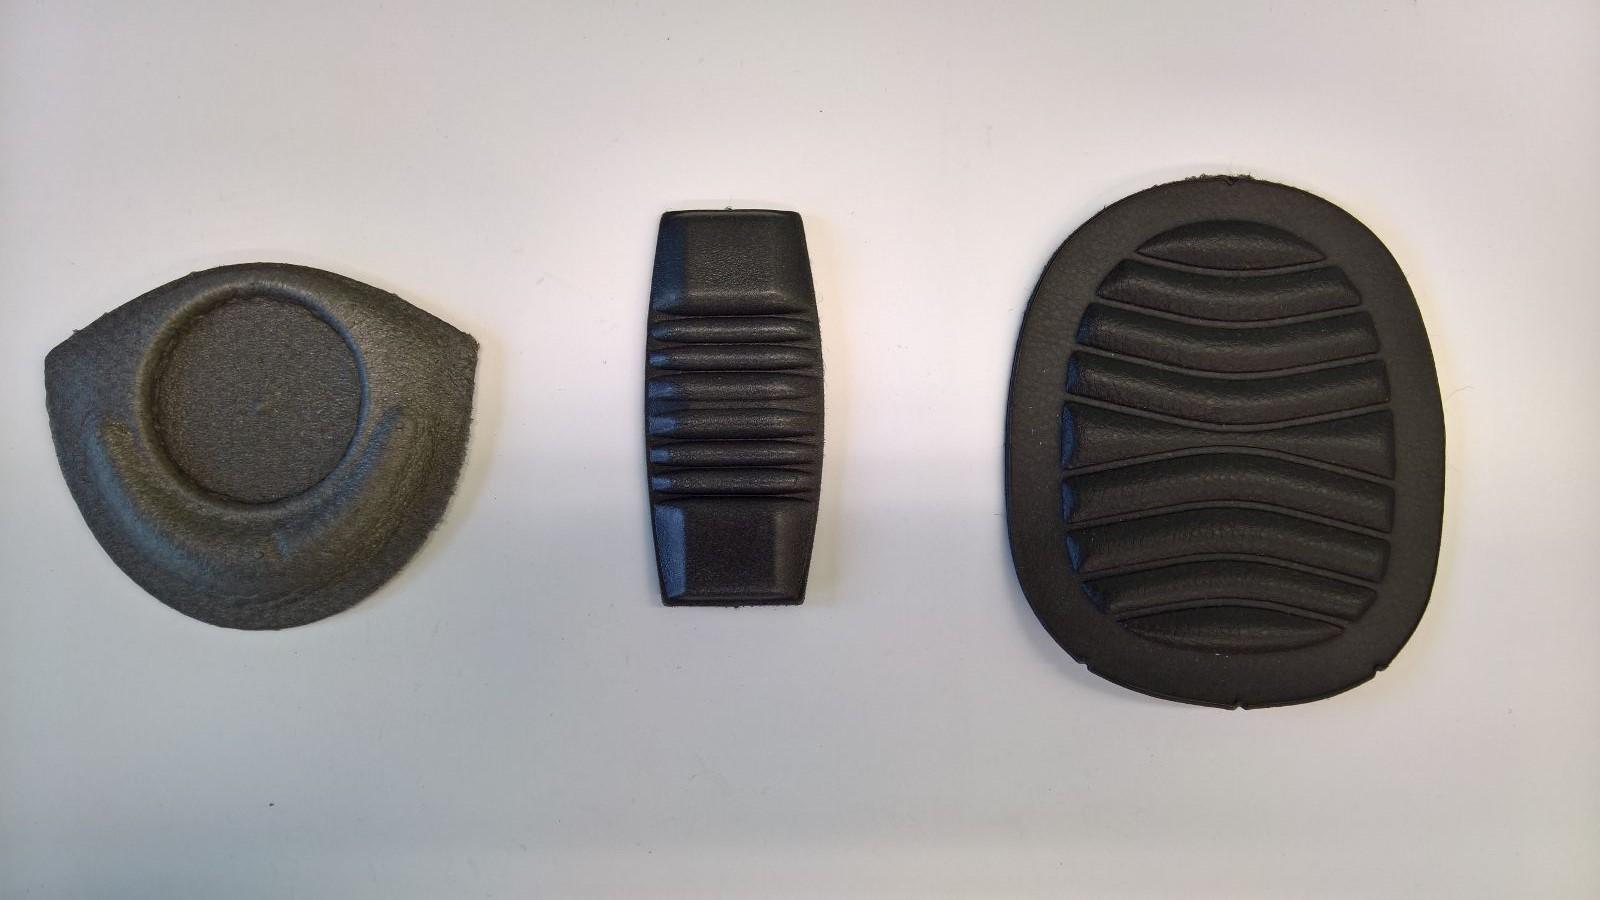 Componenti calzature Teamform